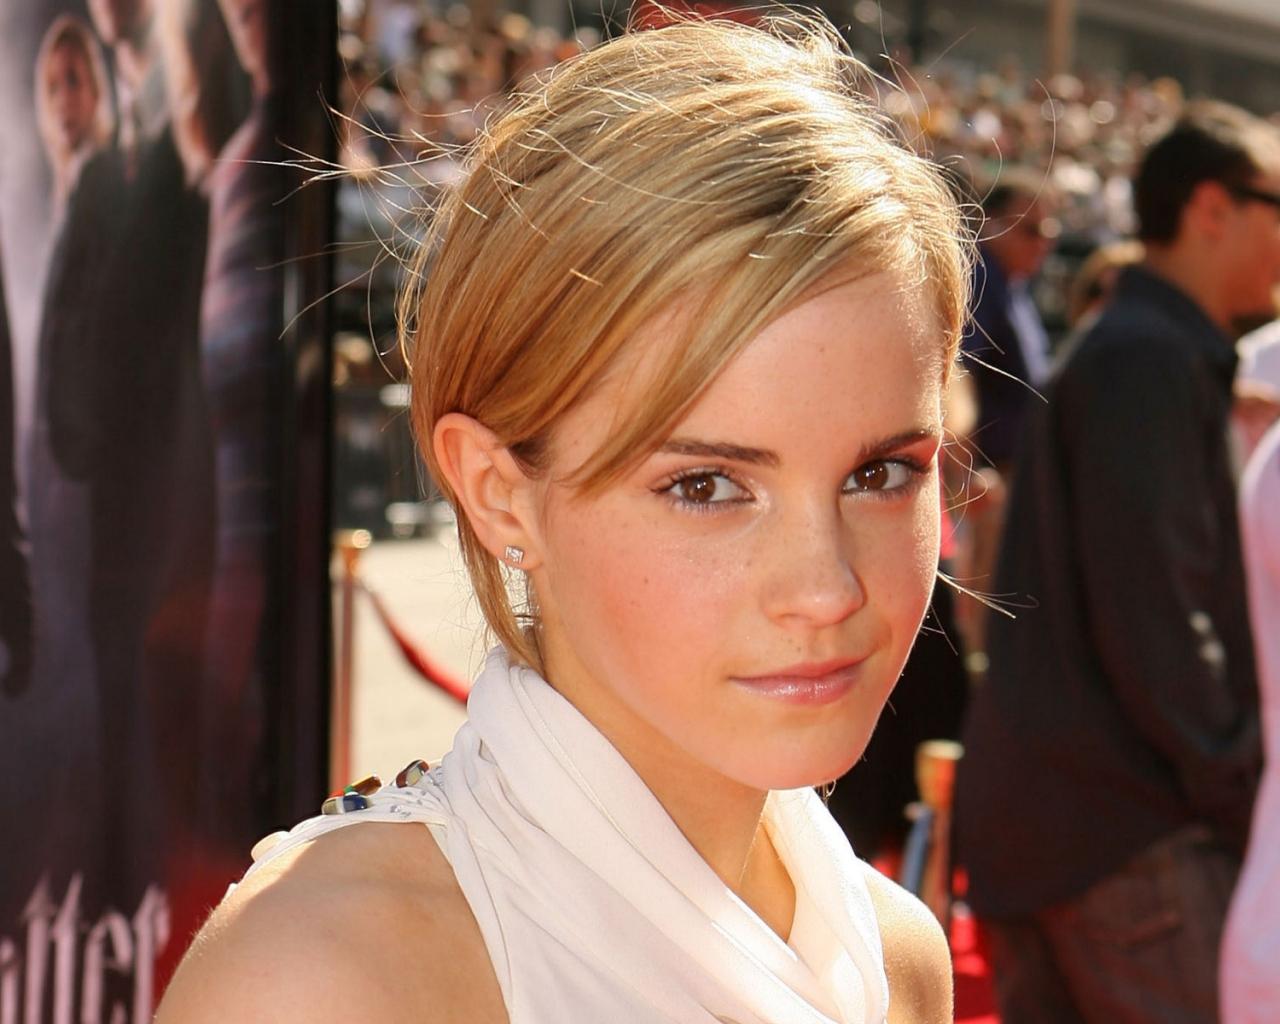 La rubia de Emma Watson - 1280x1024